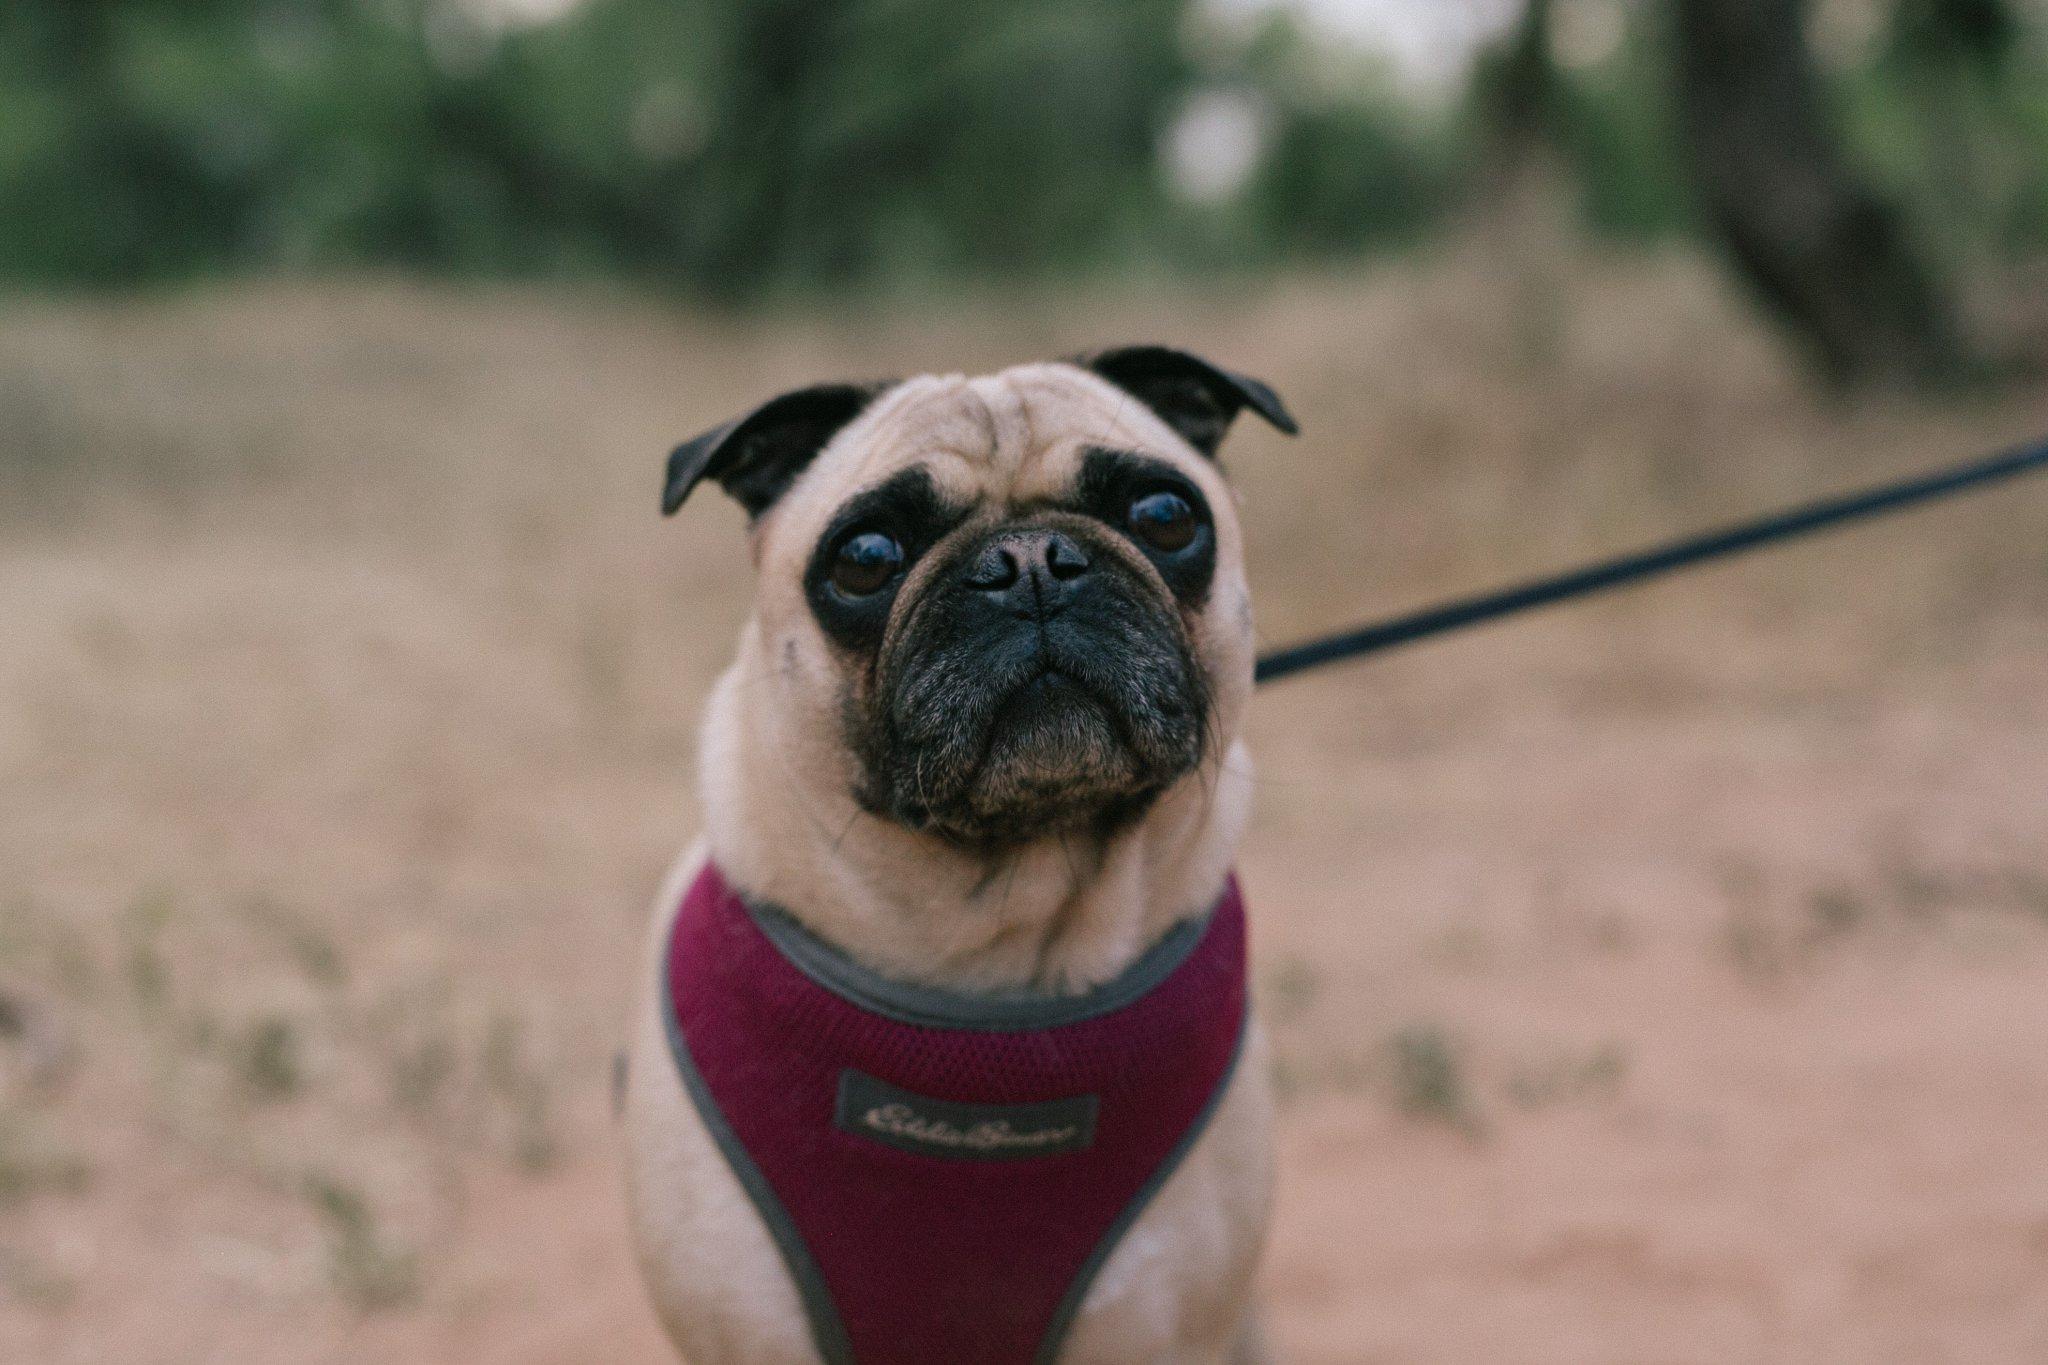 senior portrait session in Arizona with pug